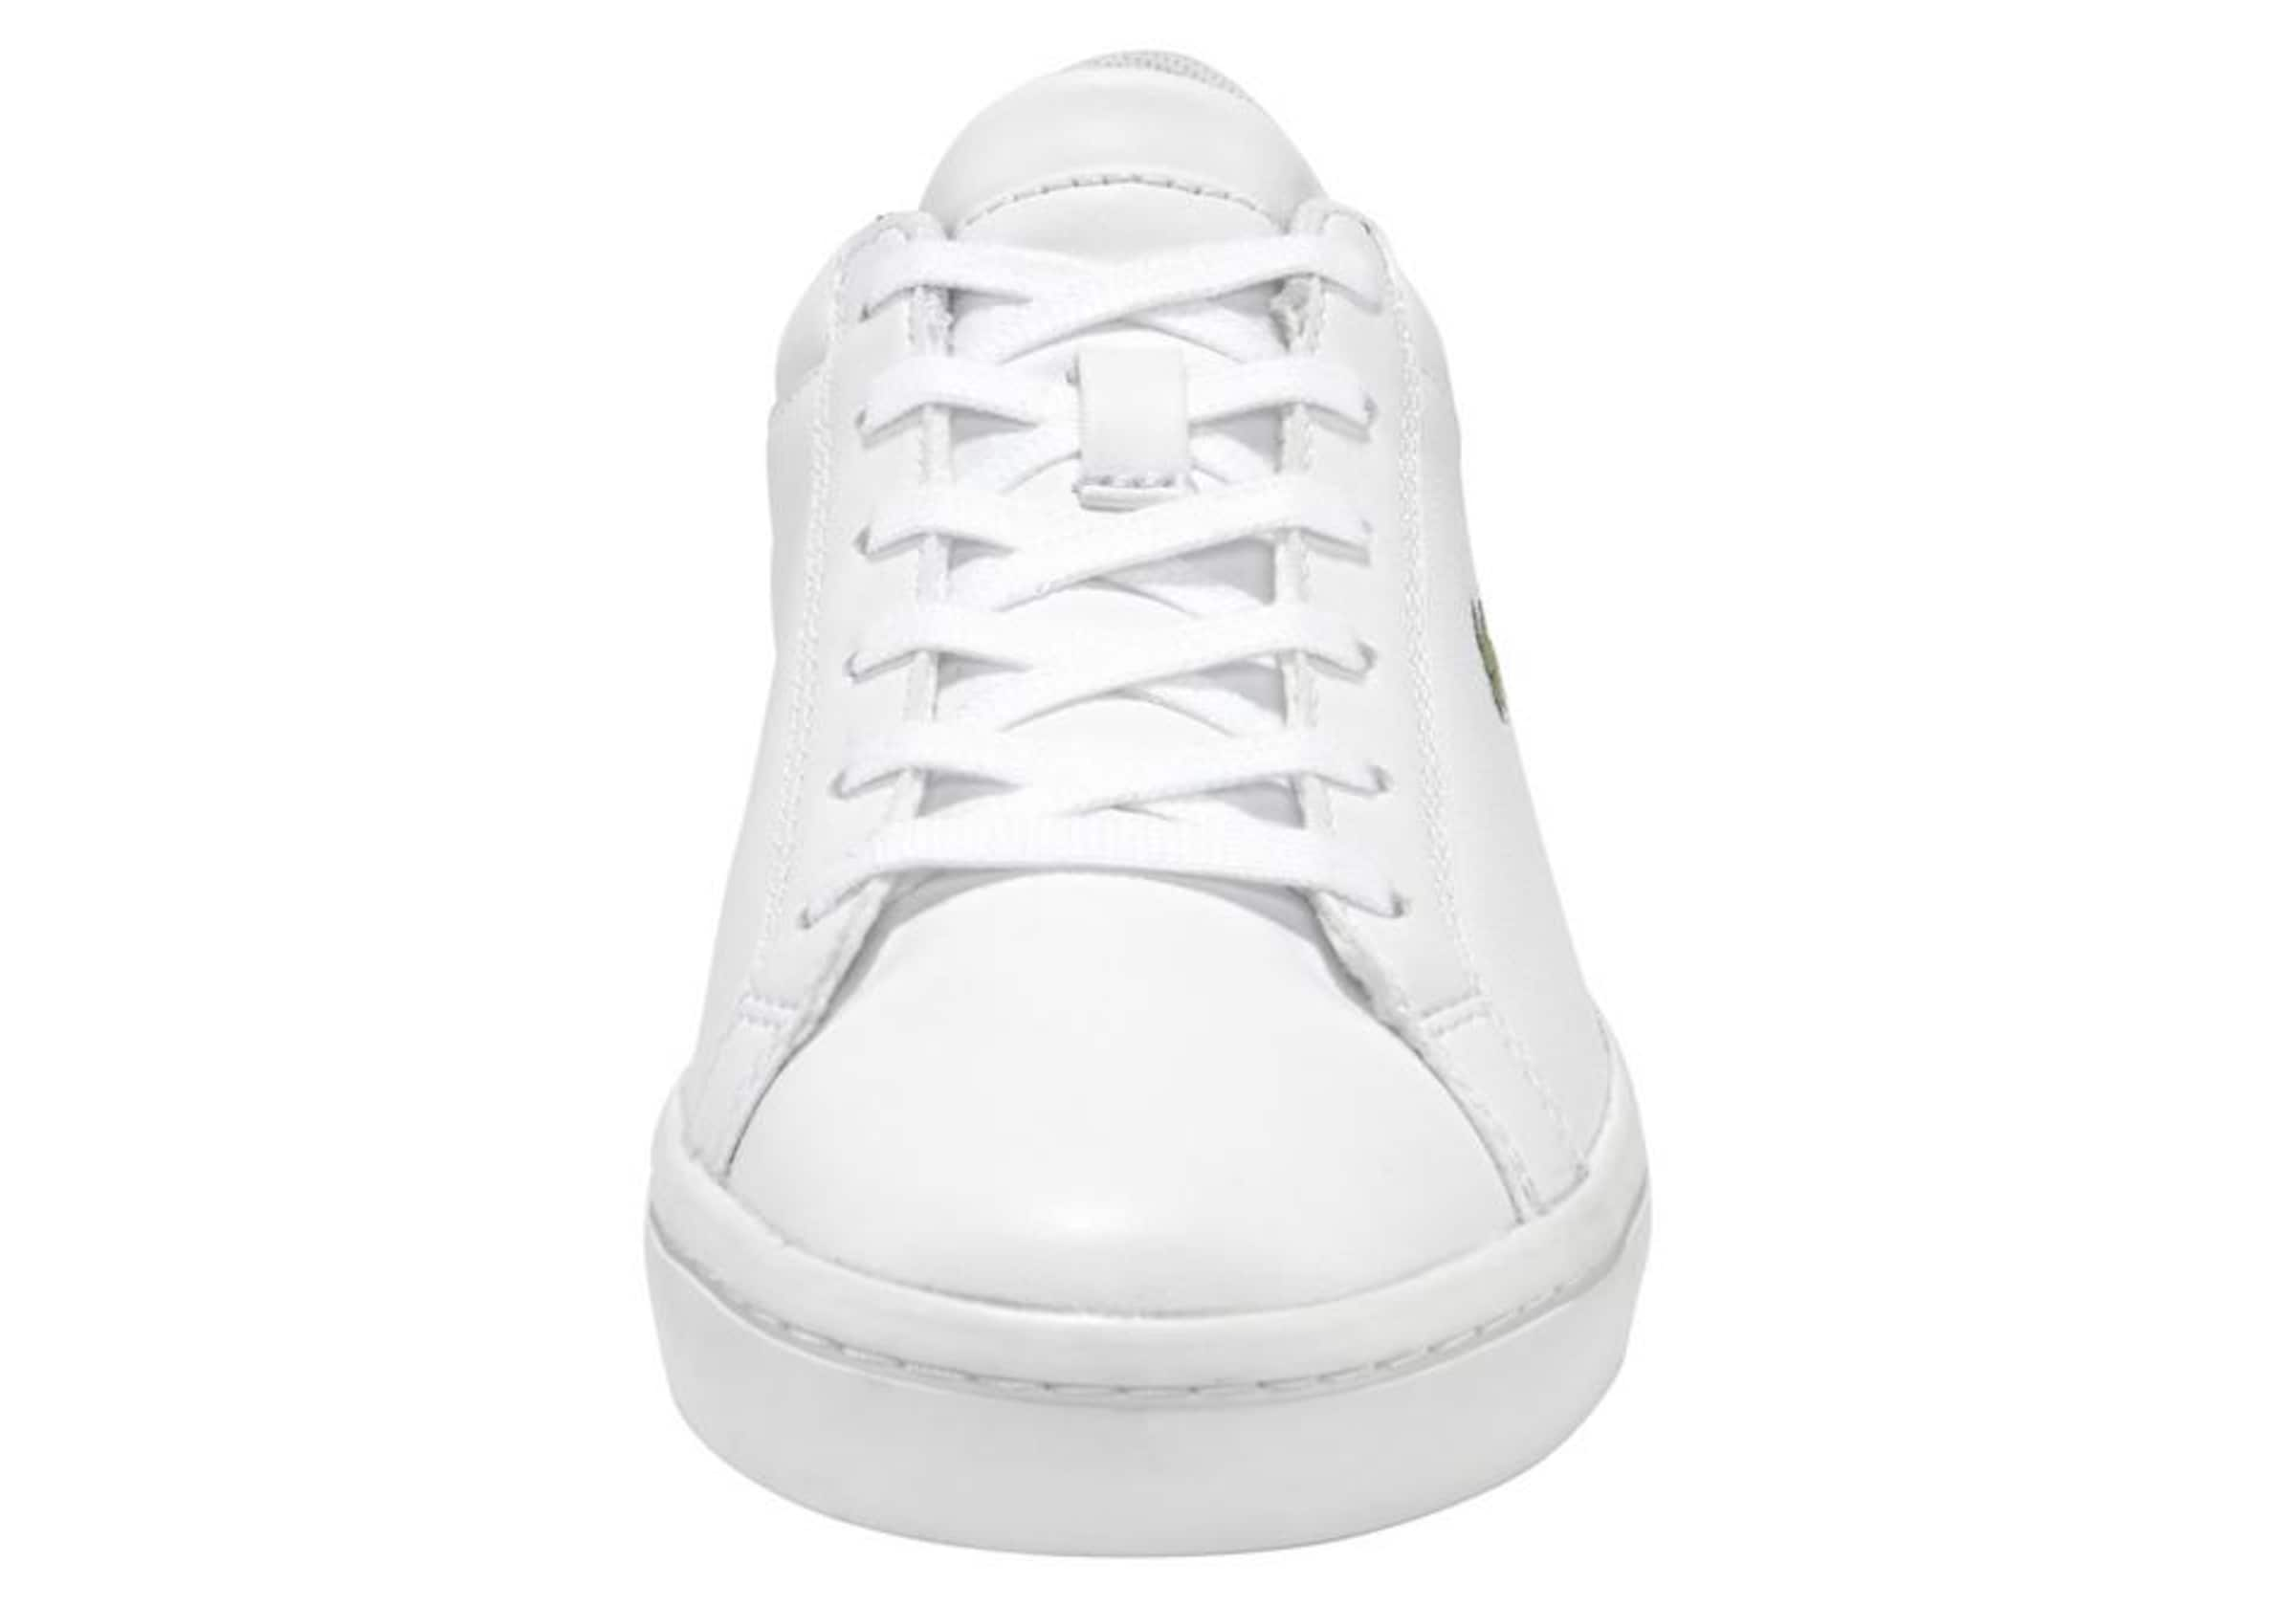 1 Bl Baskets Cfa' Lacoste Blanc 'straightset En Basses EYWH29ID